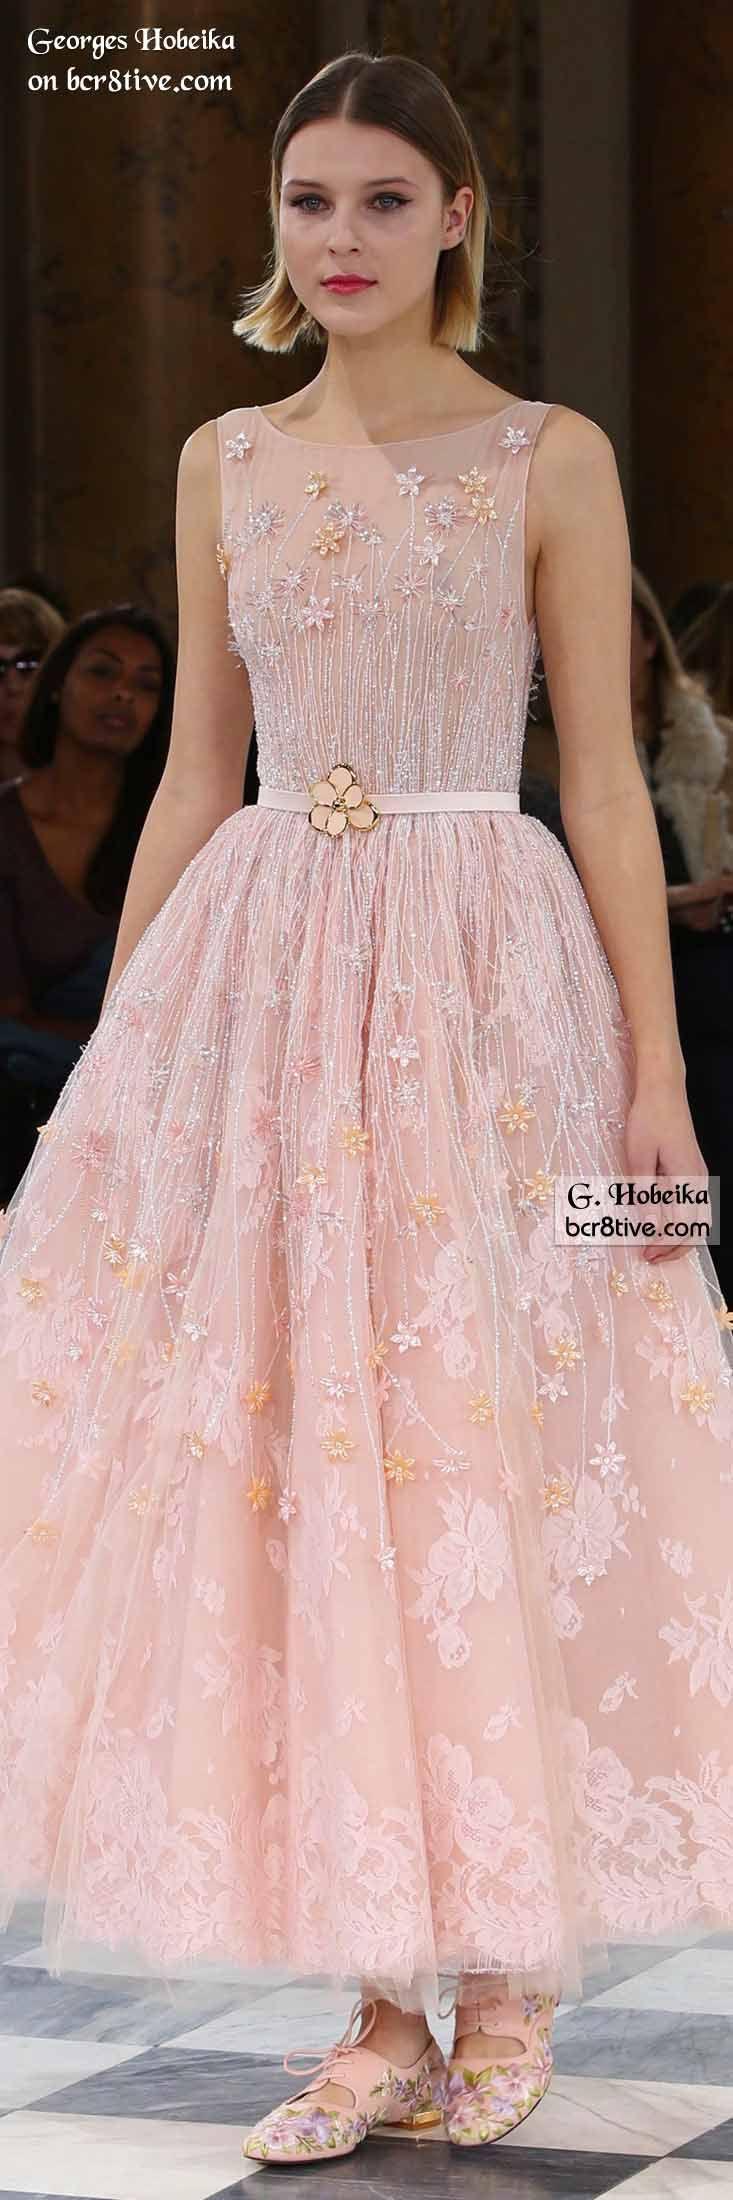 Georges Hobeika Spring 2016 Haute Couture | Vestidos de fiesta ...